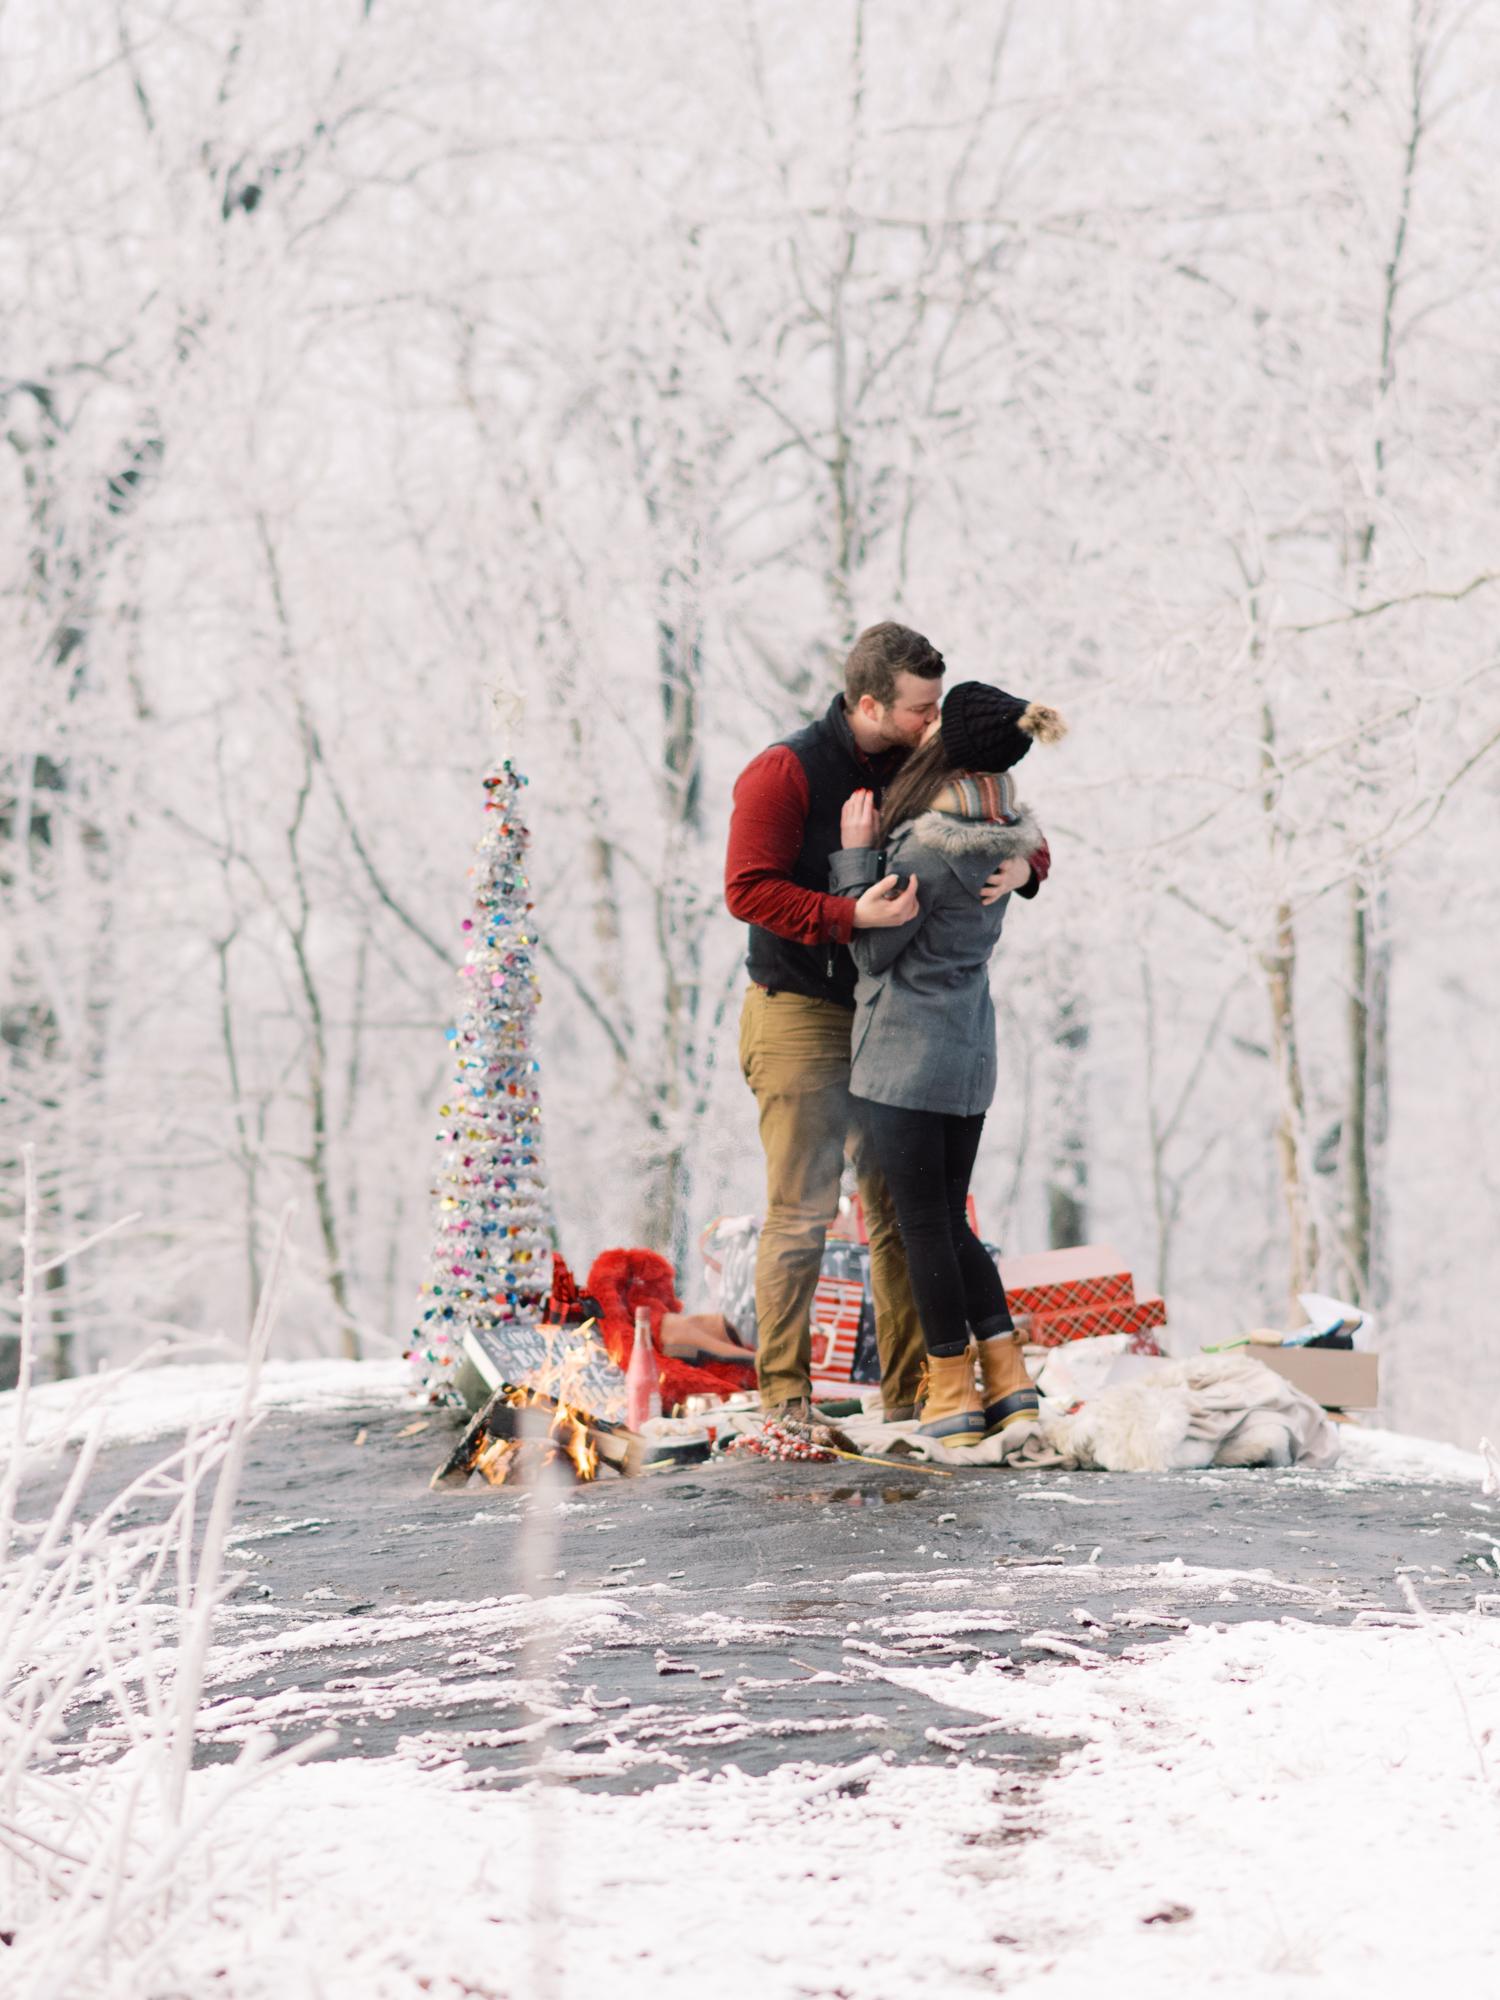 snowy-georgia-proposal-preachers-rock-atlanta-dahlonega-wedding-photographer-hannah-forsberg-fine-art-film-10.jpg